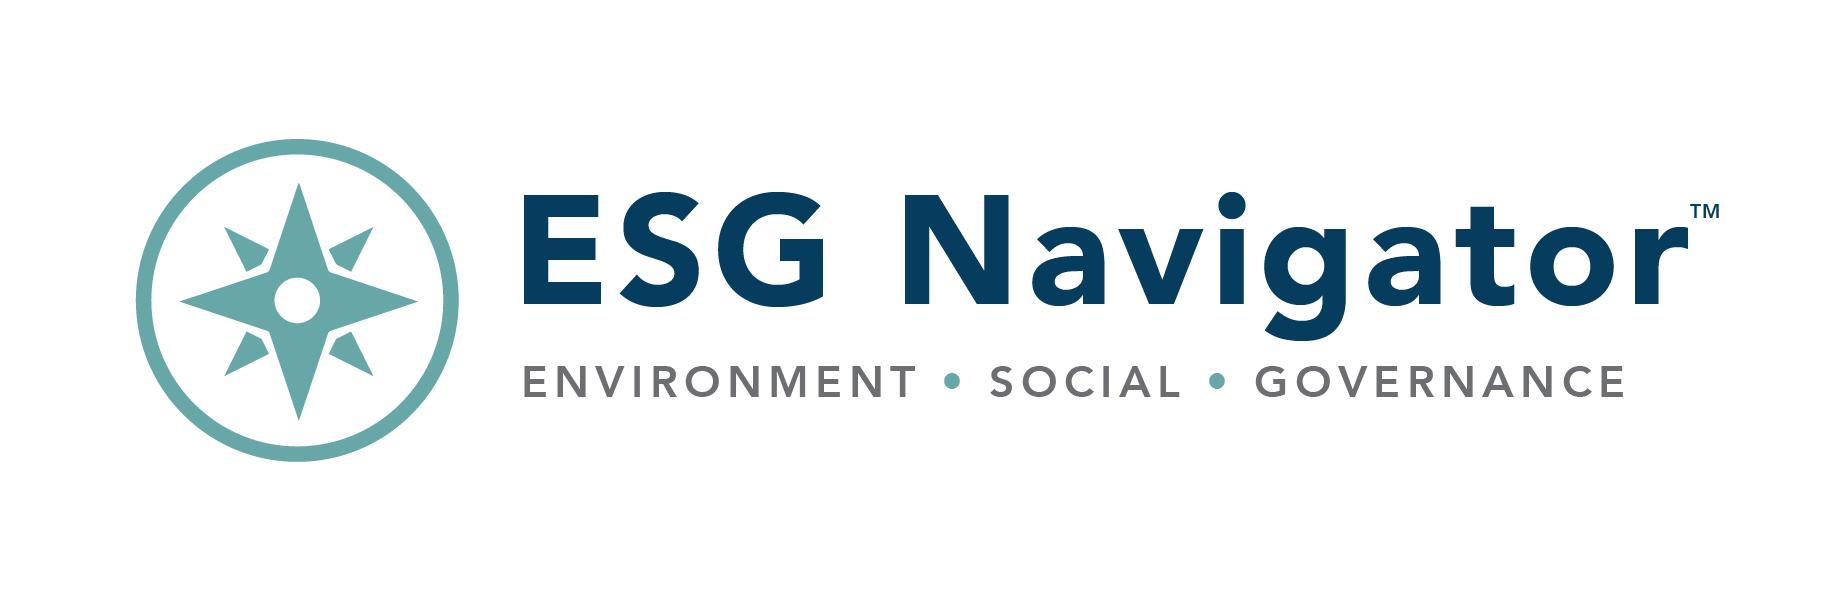 ESG Navigator